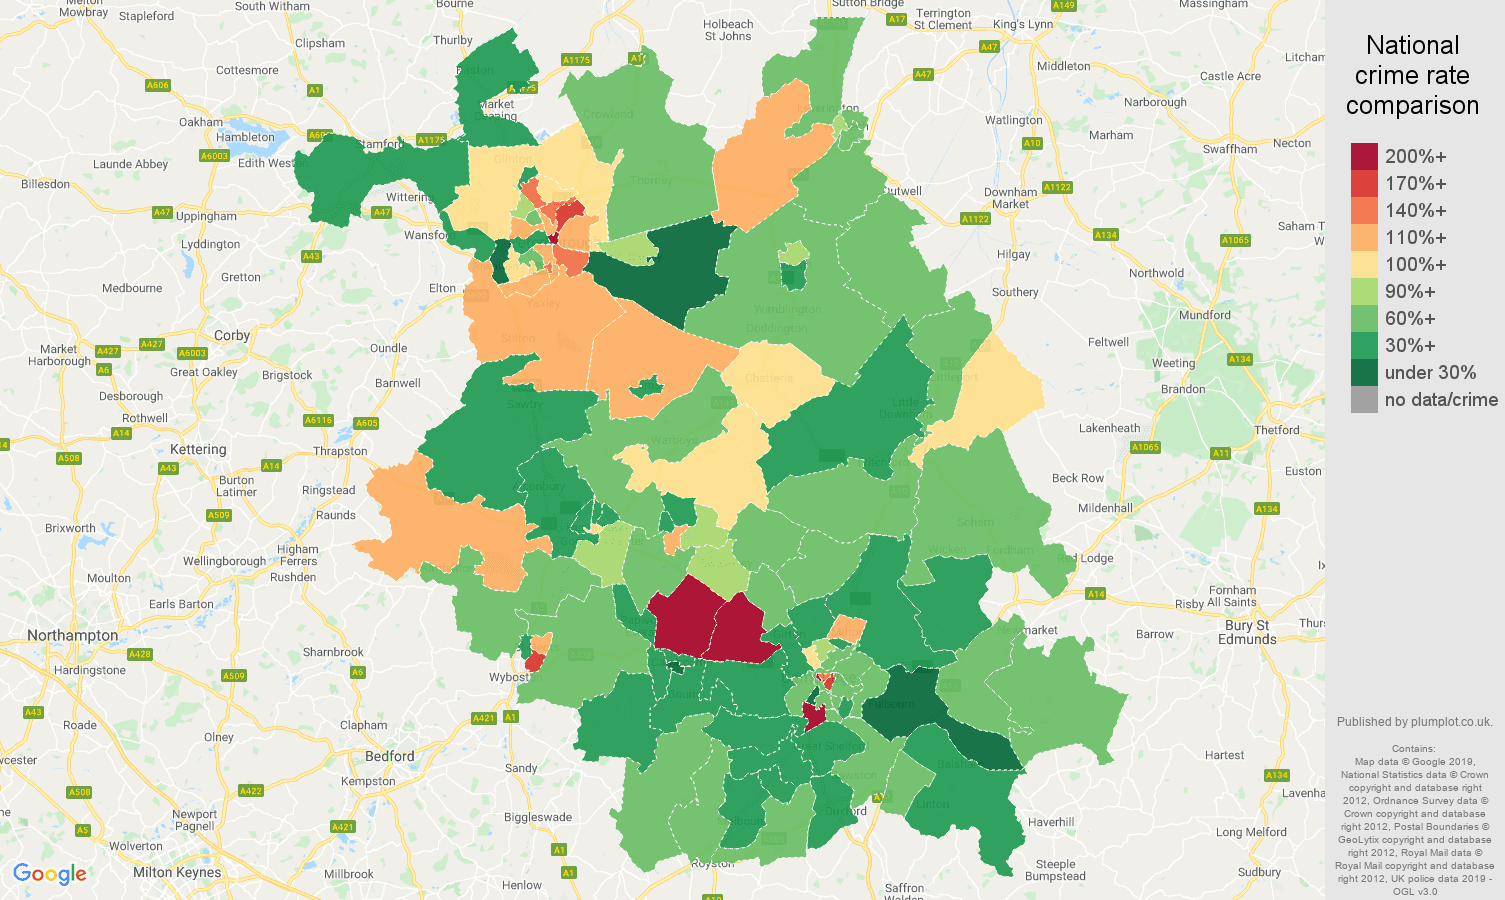 Cambridgeshire other theft crime rate comparison map